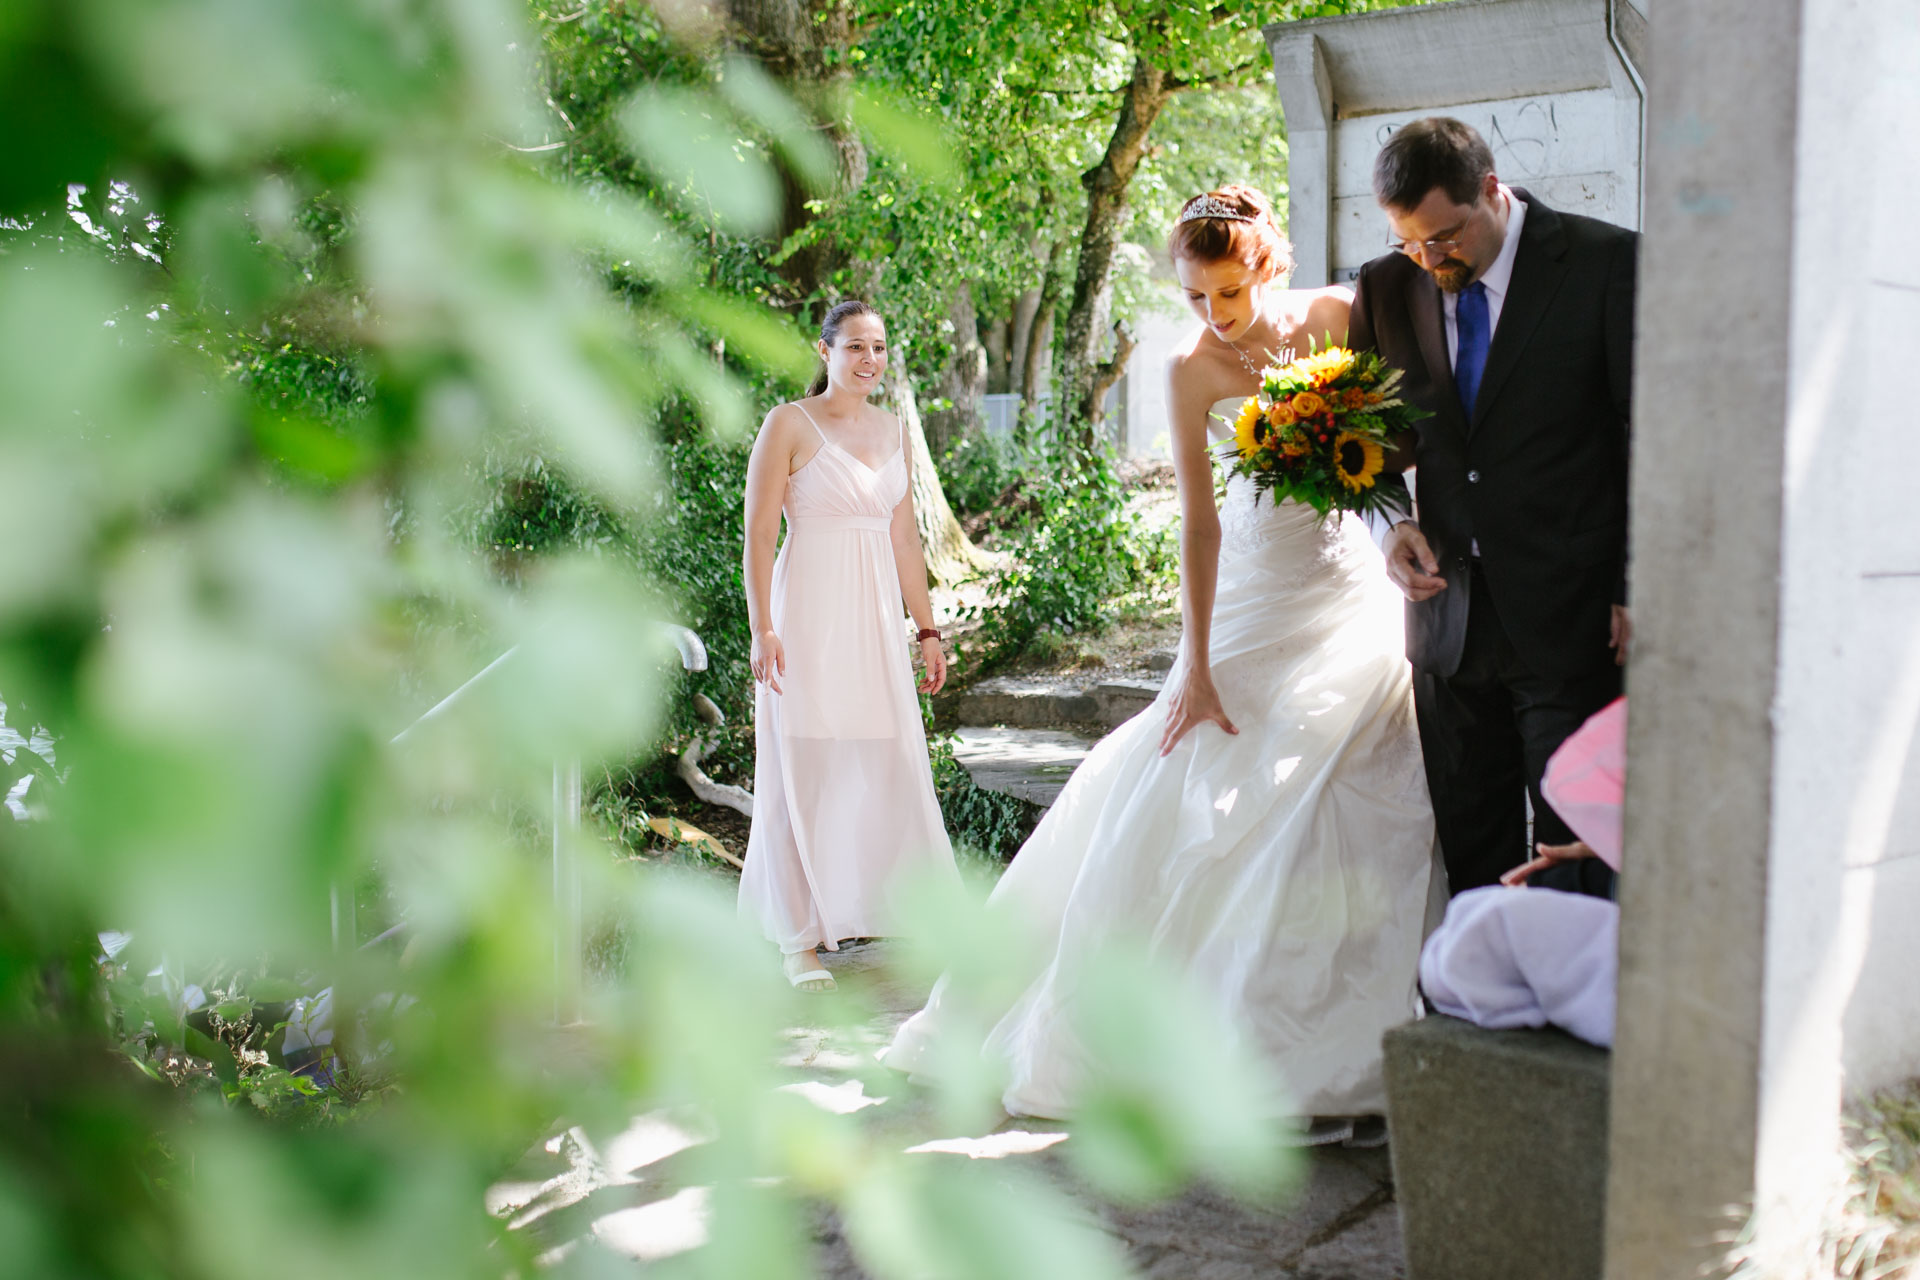 Pixelart_Hochzeitsfotografen_Loerrach_Rheinfelden_Hallwil_Schweiz_Linda-Ramon-1021